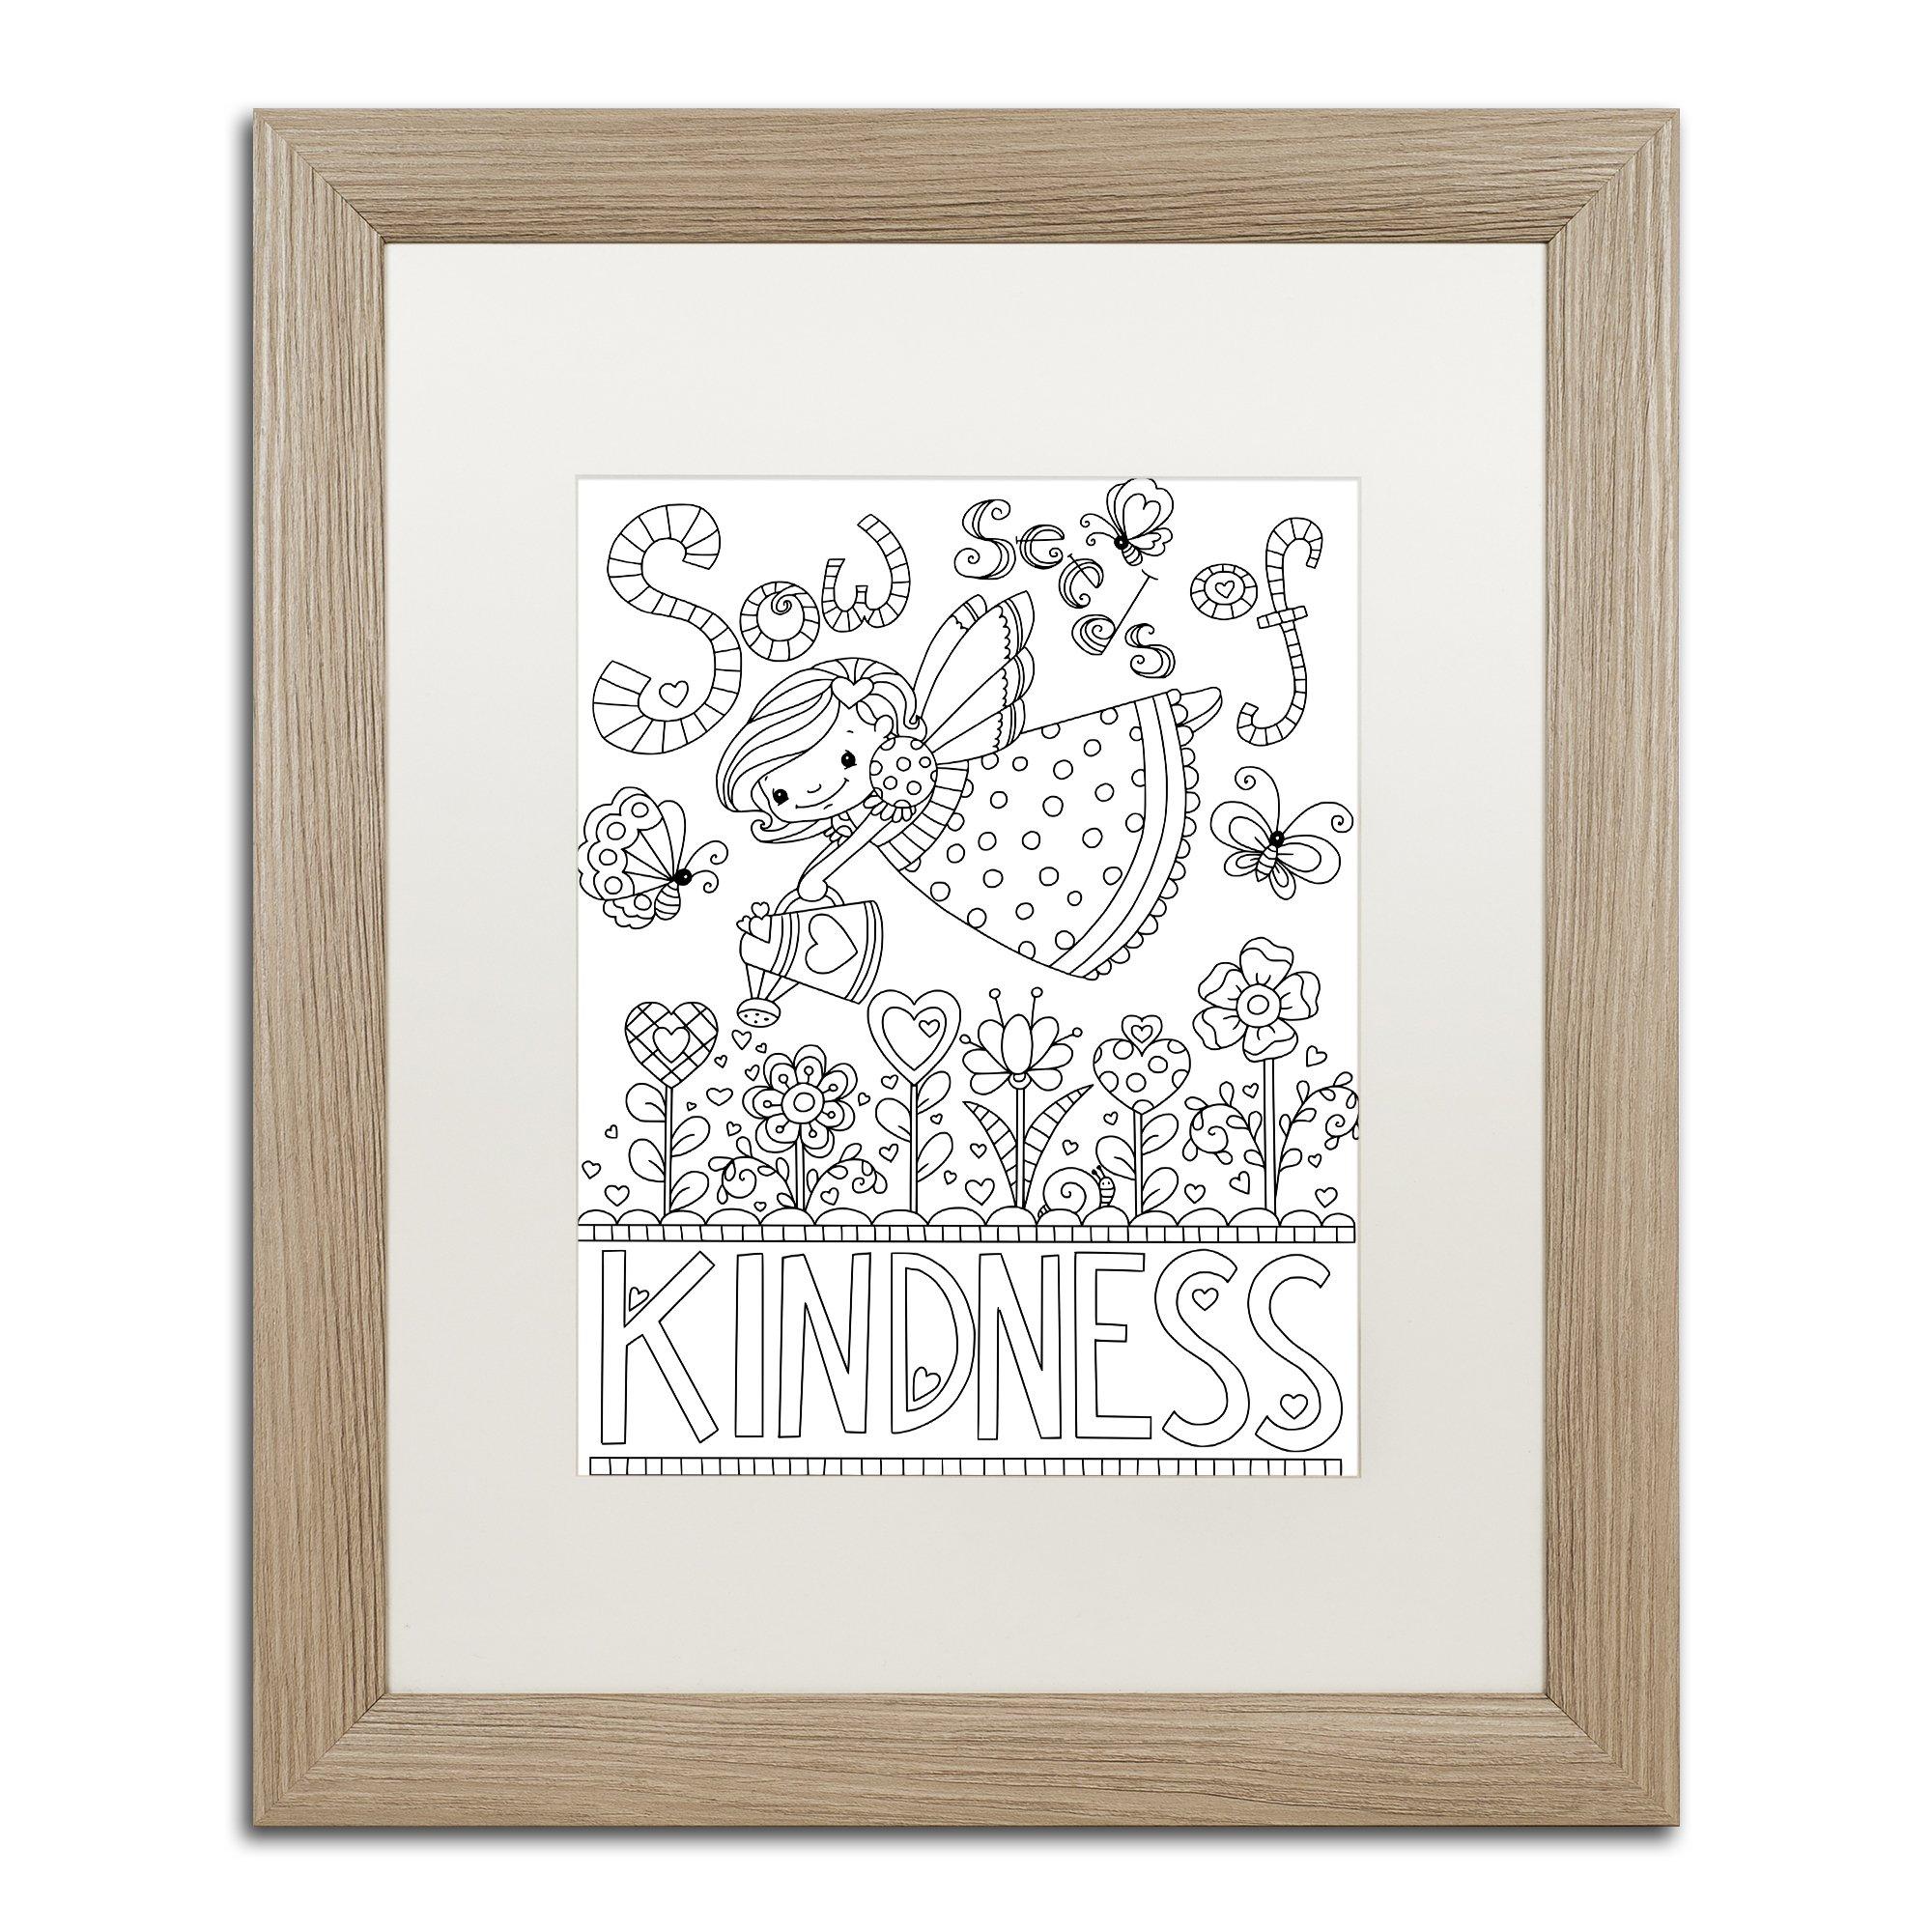 Sow Seeds by Jennifer Nilsson, White Matte, Birch Frame 16x20-Inch by Trademark Fine Art